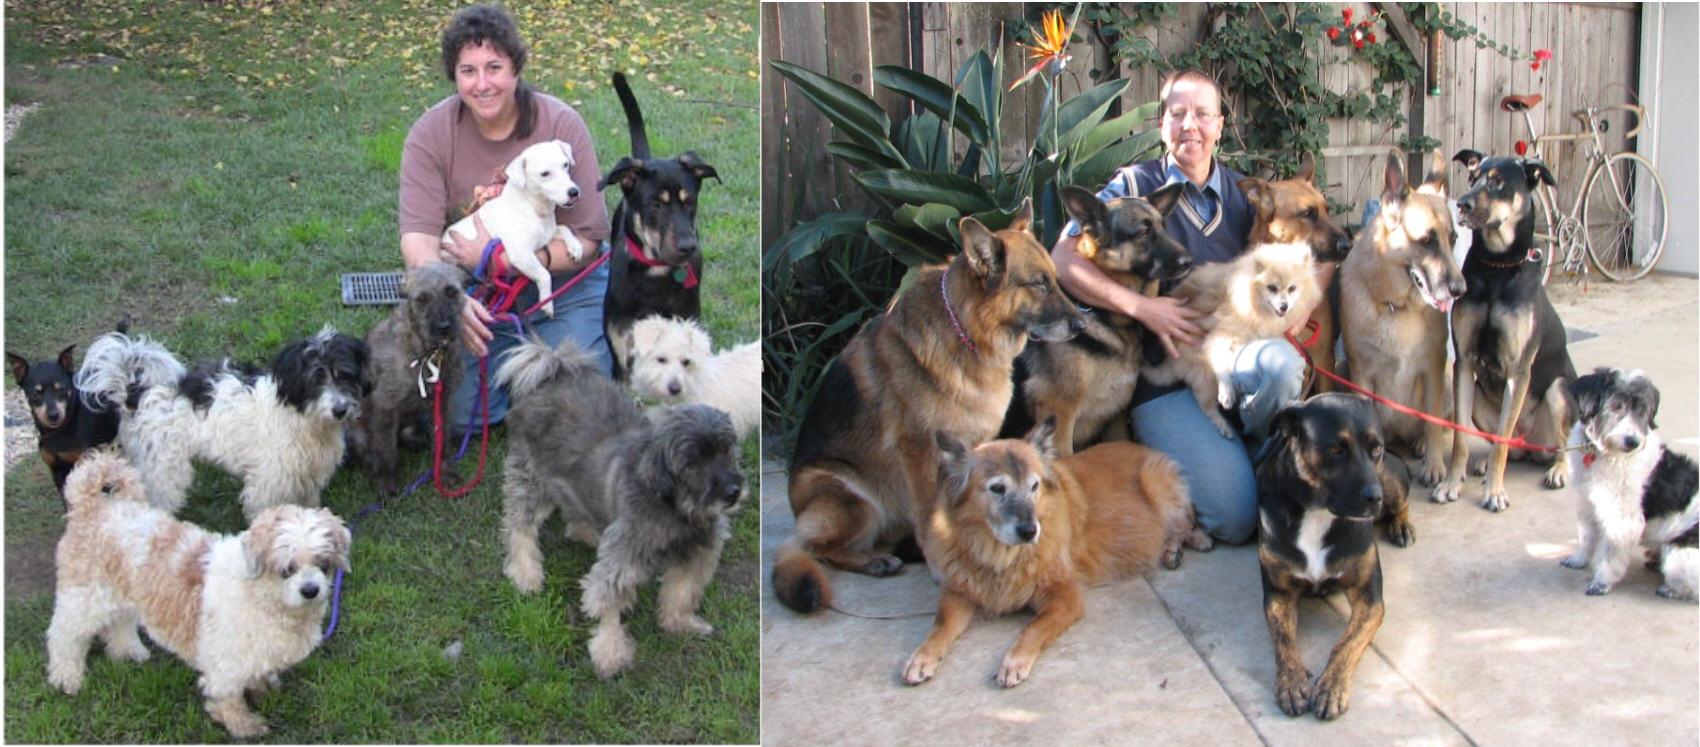 Chellaston Derby Dog Rescue